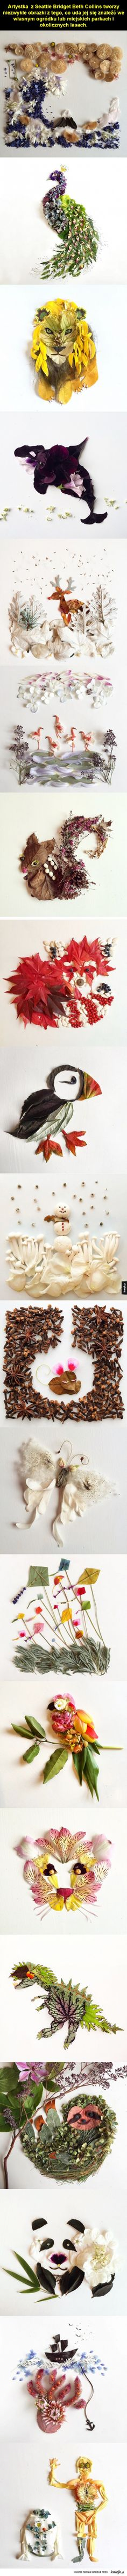 Botaniczna sztuka